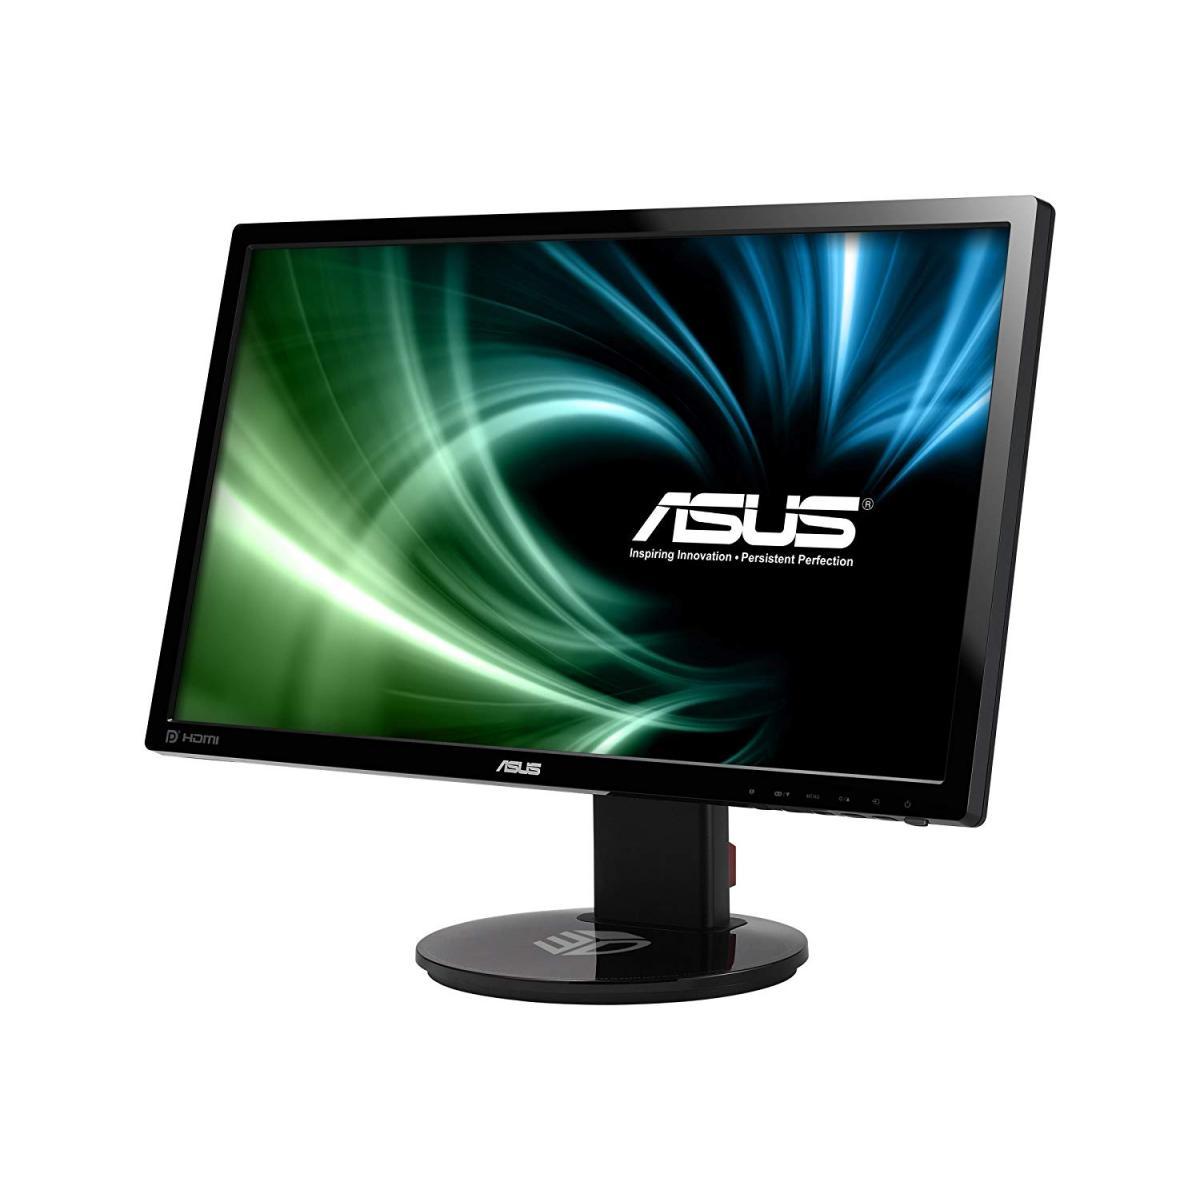 "ASUS VG248QE Gaming Monitor -24"" FHD (1920x1080)"